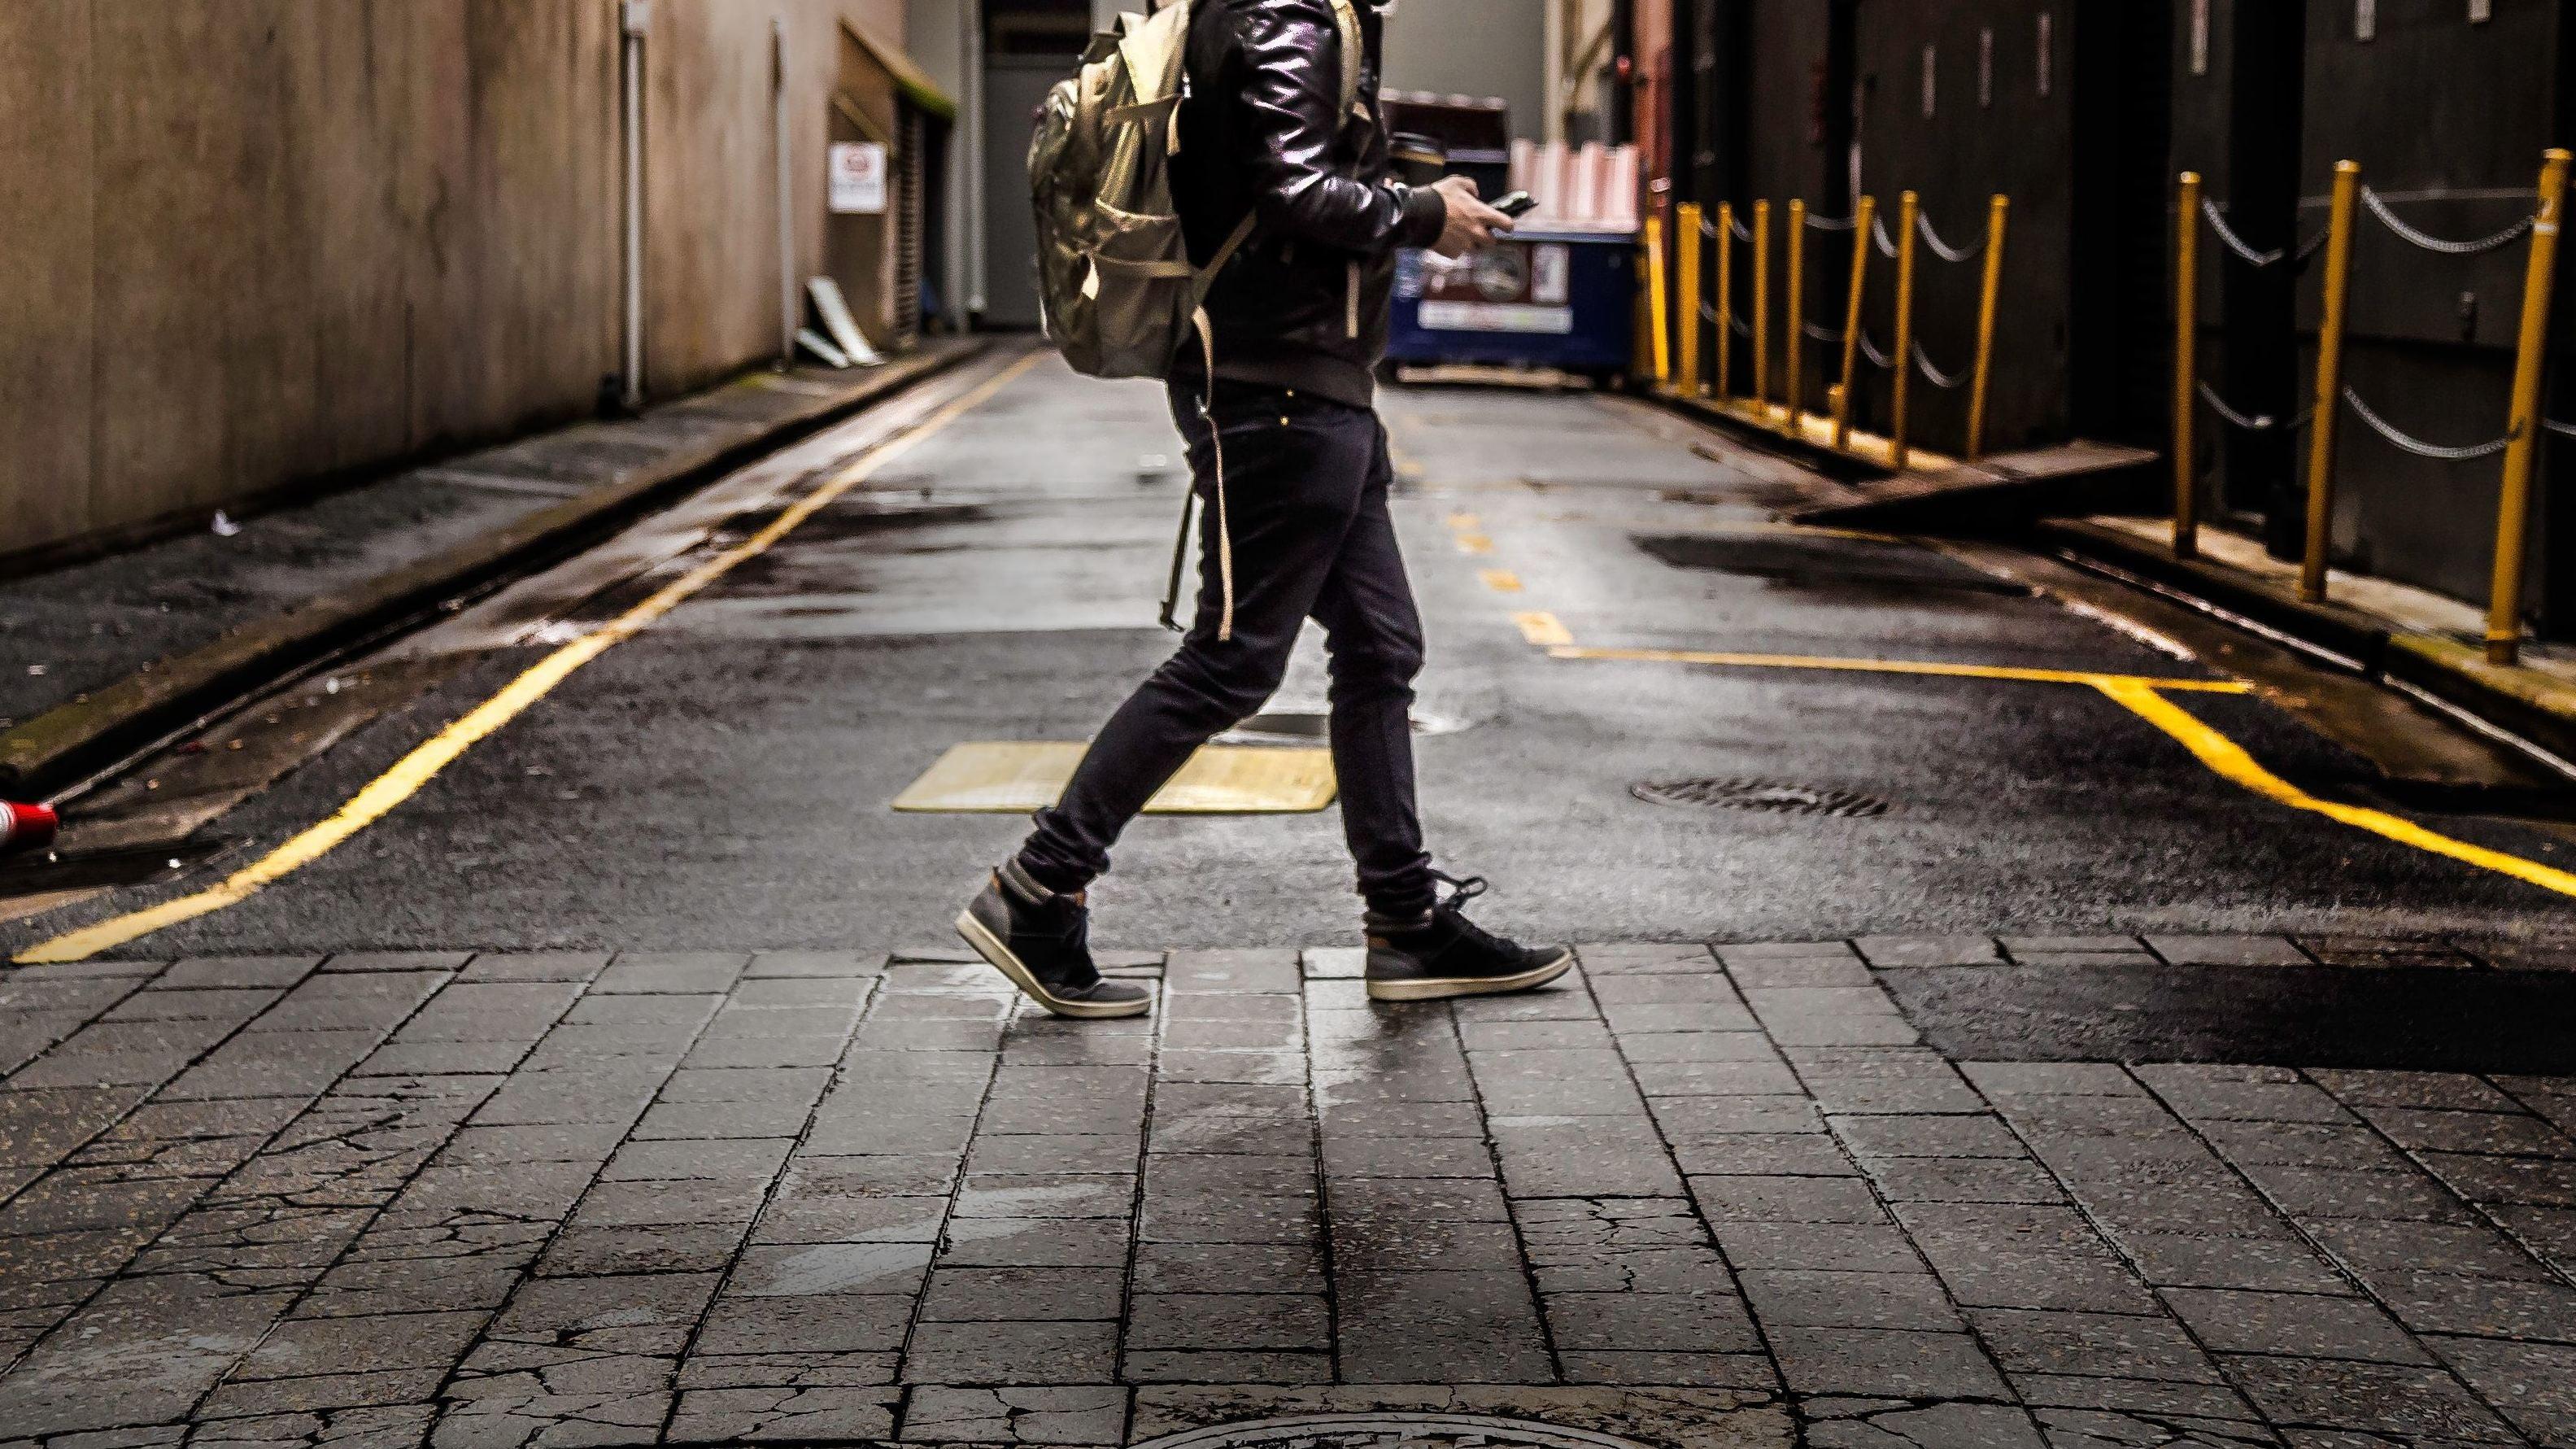 Honolulu May Soon Ban Texting While Crossing The Street Like A Dumbarse